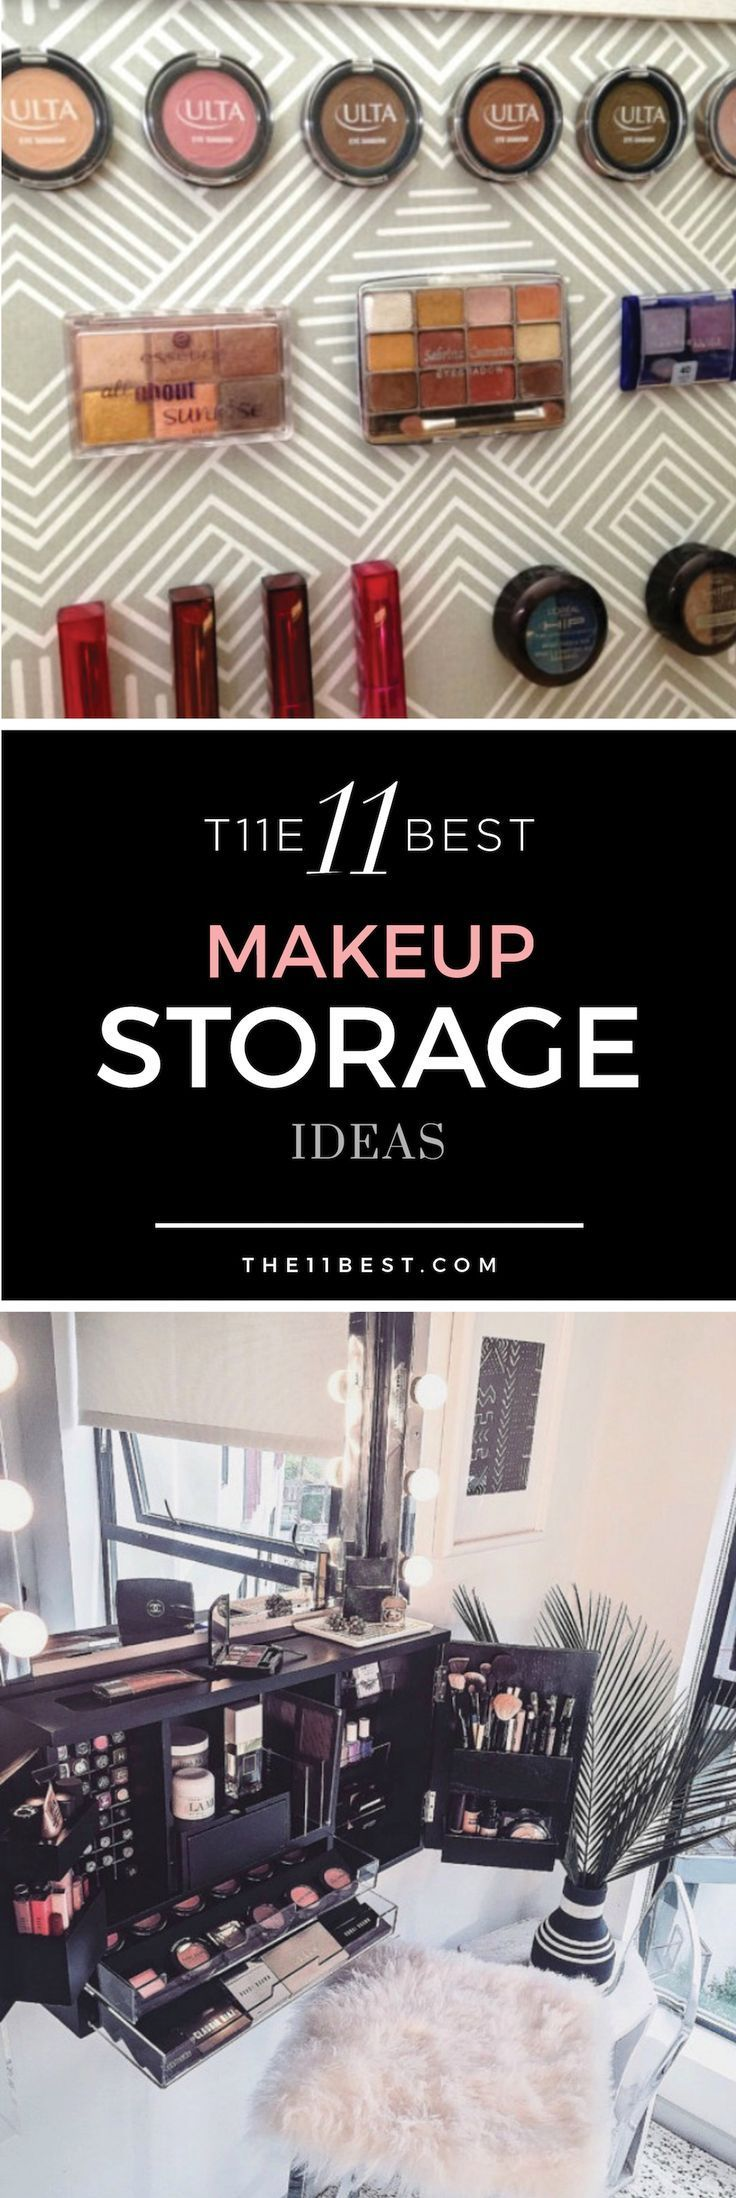 I NEED THIS! Makeup storage and organization ideas. DIY